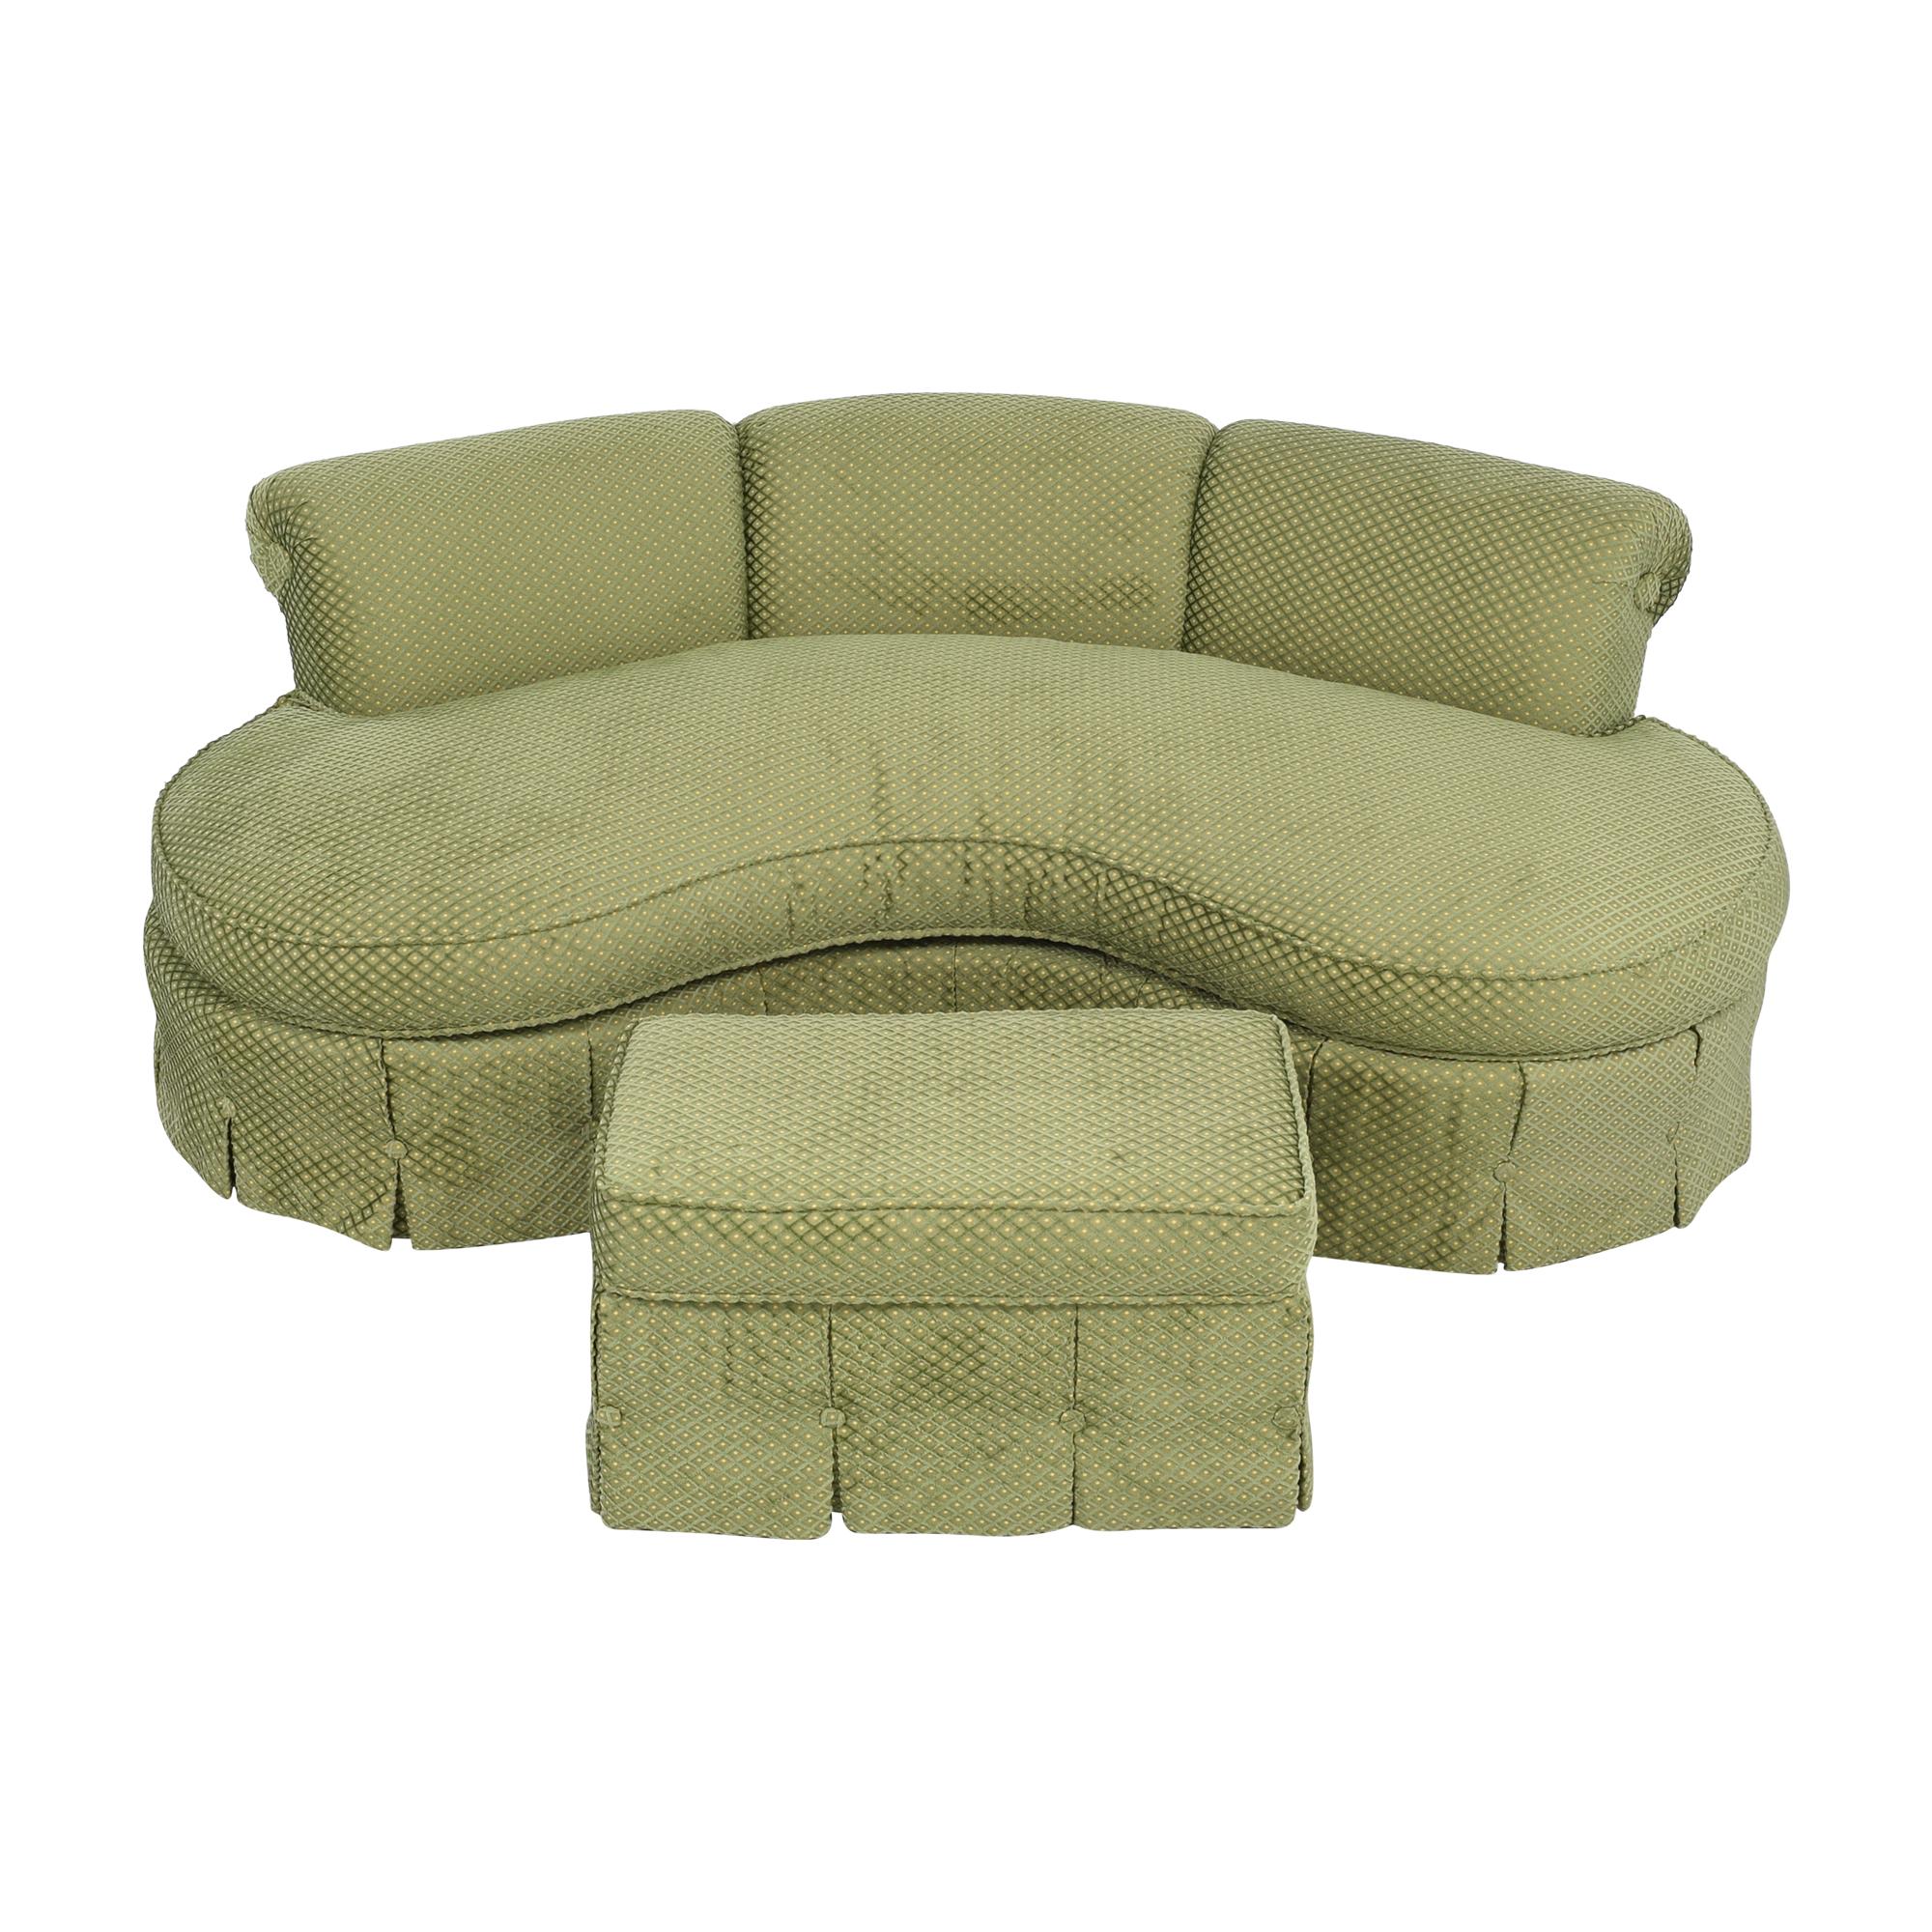 Custom Curved Sofa with Skirted Base and Matching Ottoman ma